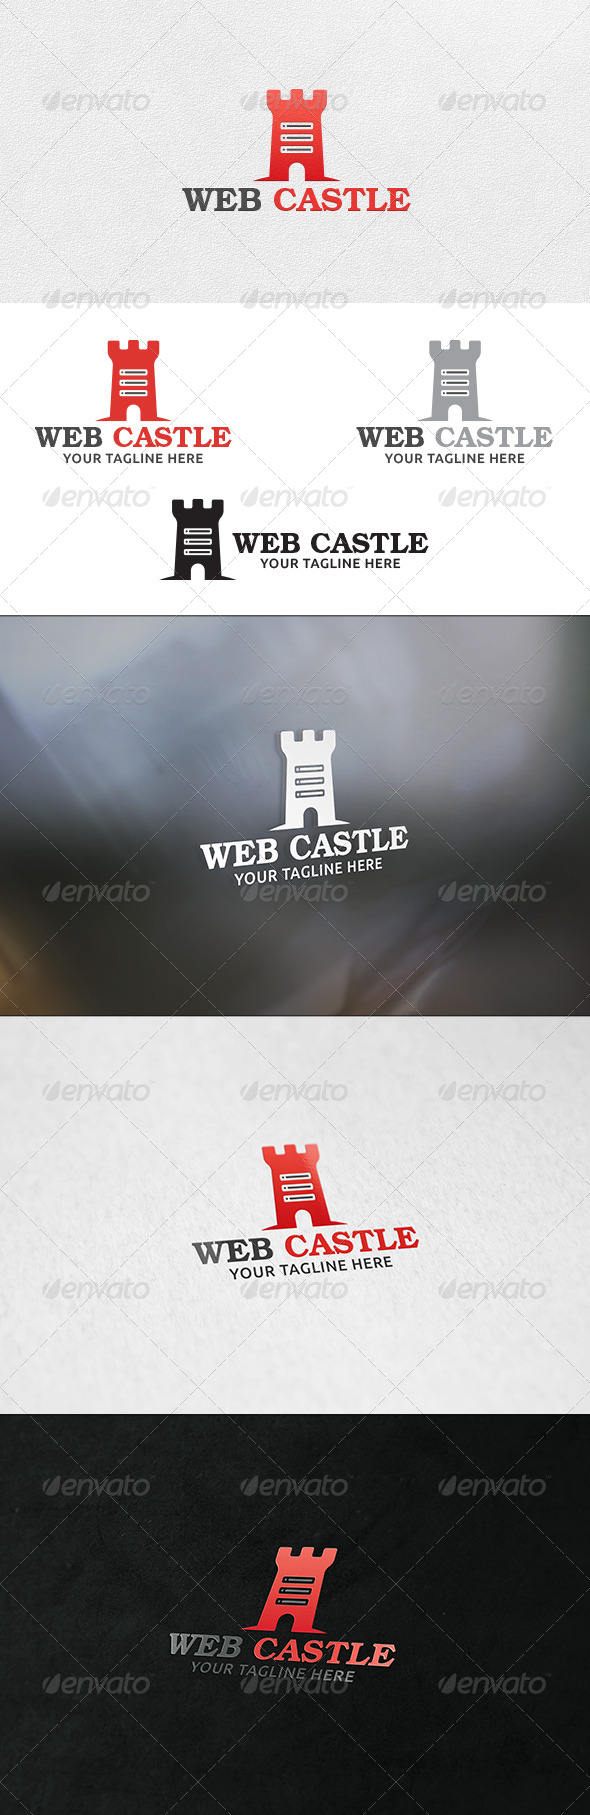 Web Castle - Logo Template - Buildings Logo Templates